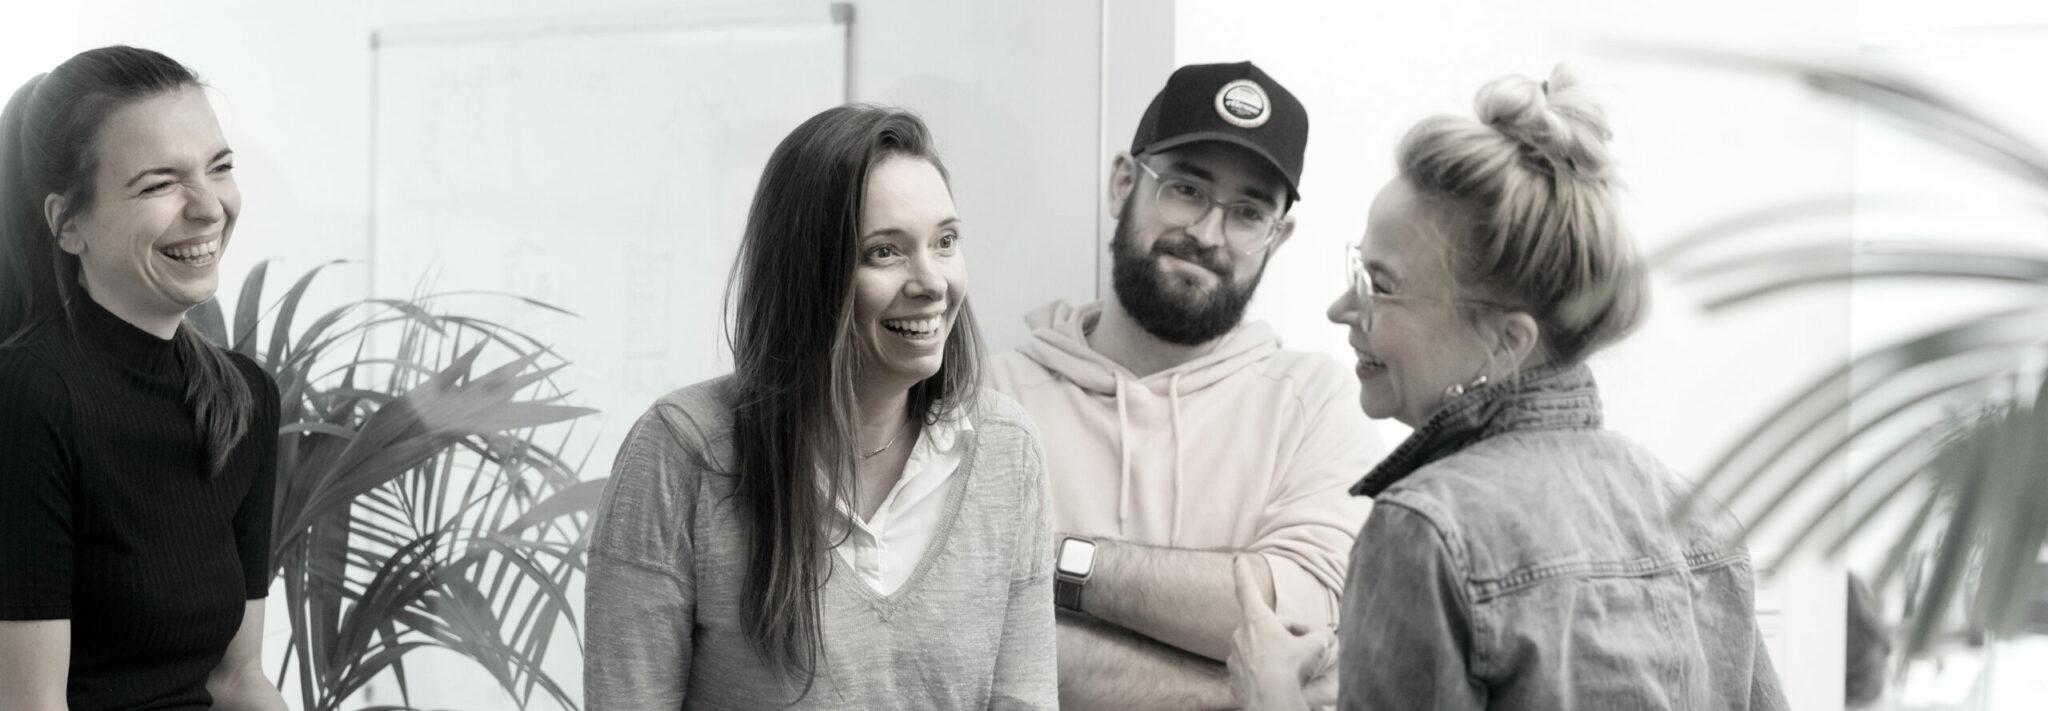 vier Personen lachend